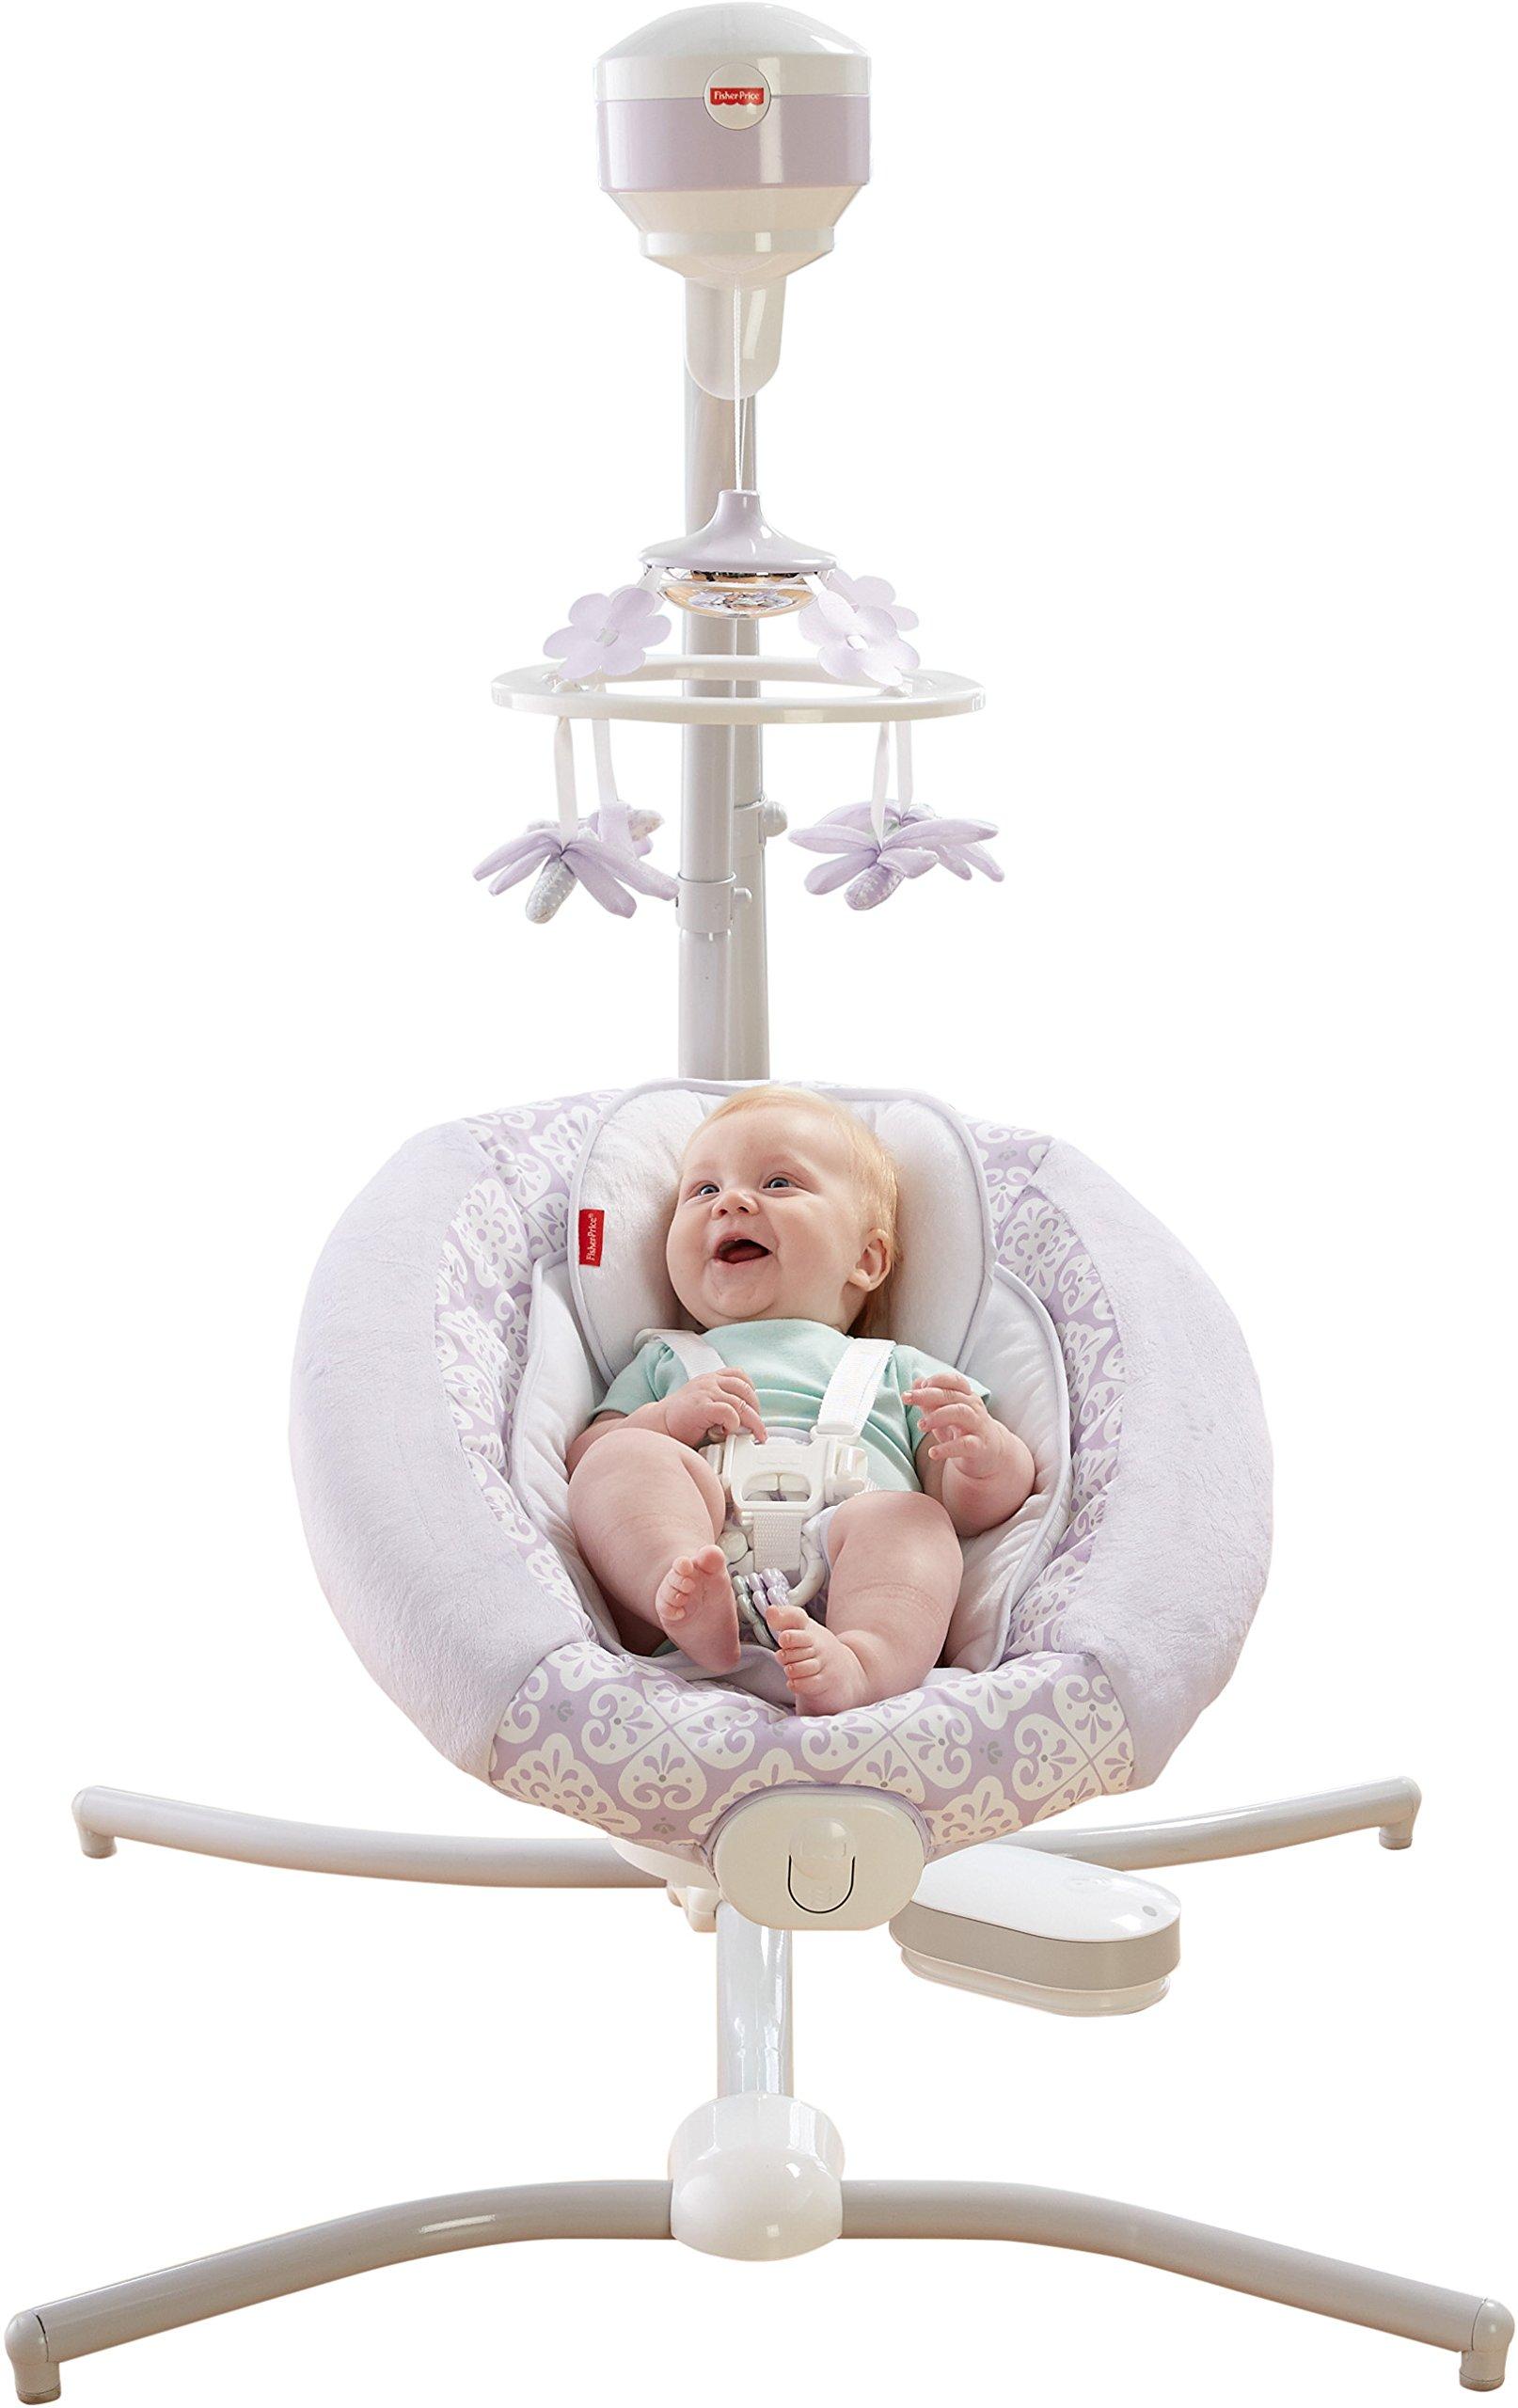 Amazon.com : Fisher-Price Fairytale Deluxe Bouncer : Baby